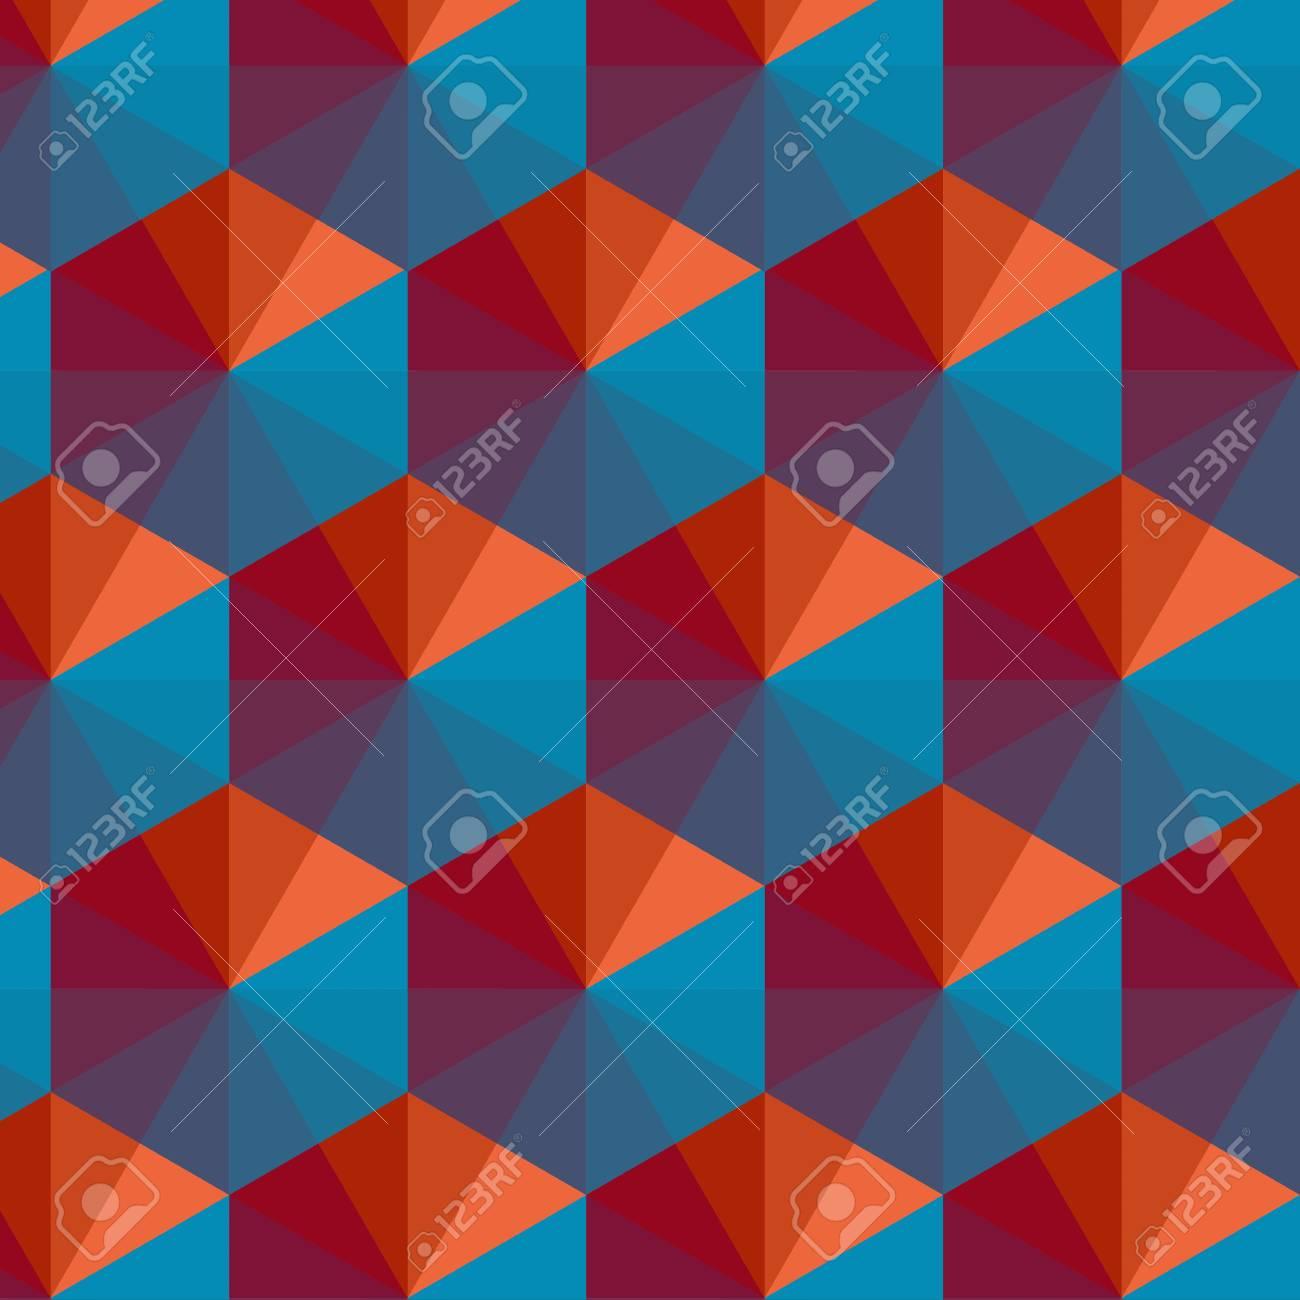 Geometric Triangle Pattern Background - Vector Illustration - 92356407